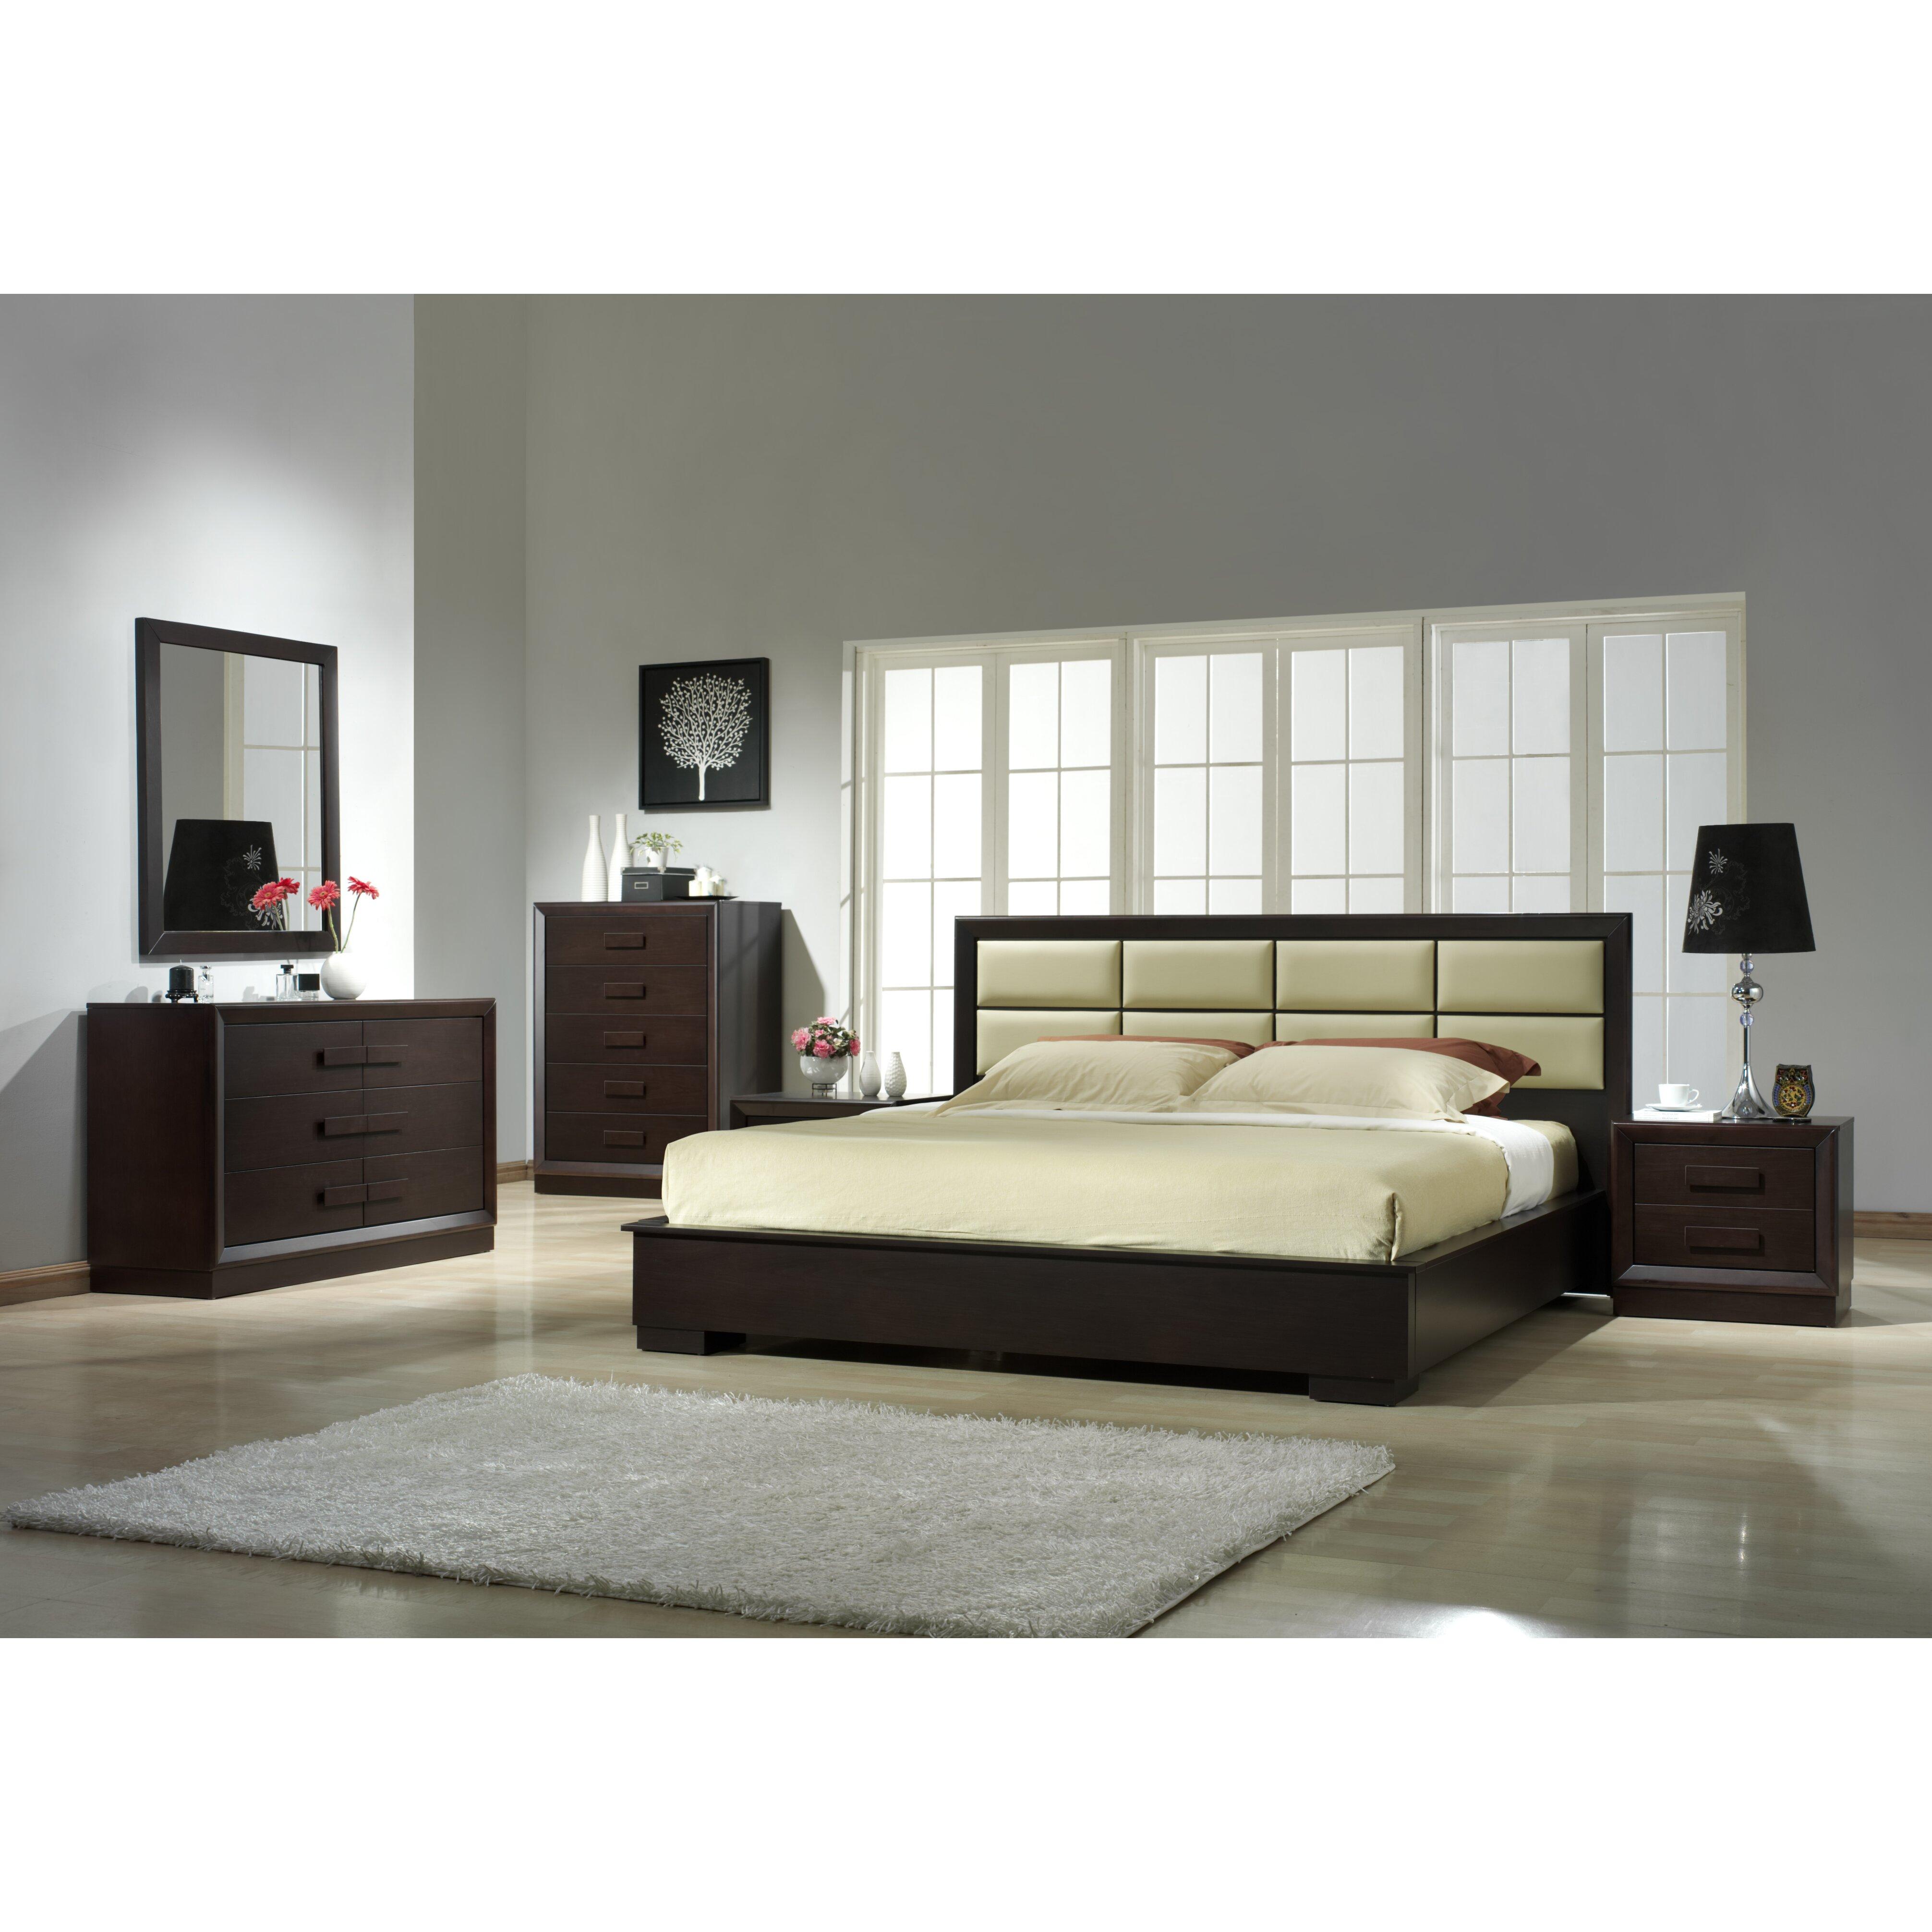 mondello 4pc set bedroom set madrid platform furniture. styleup.co